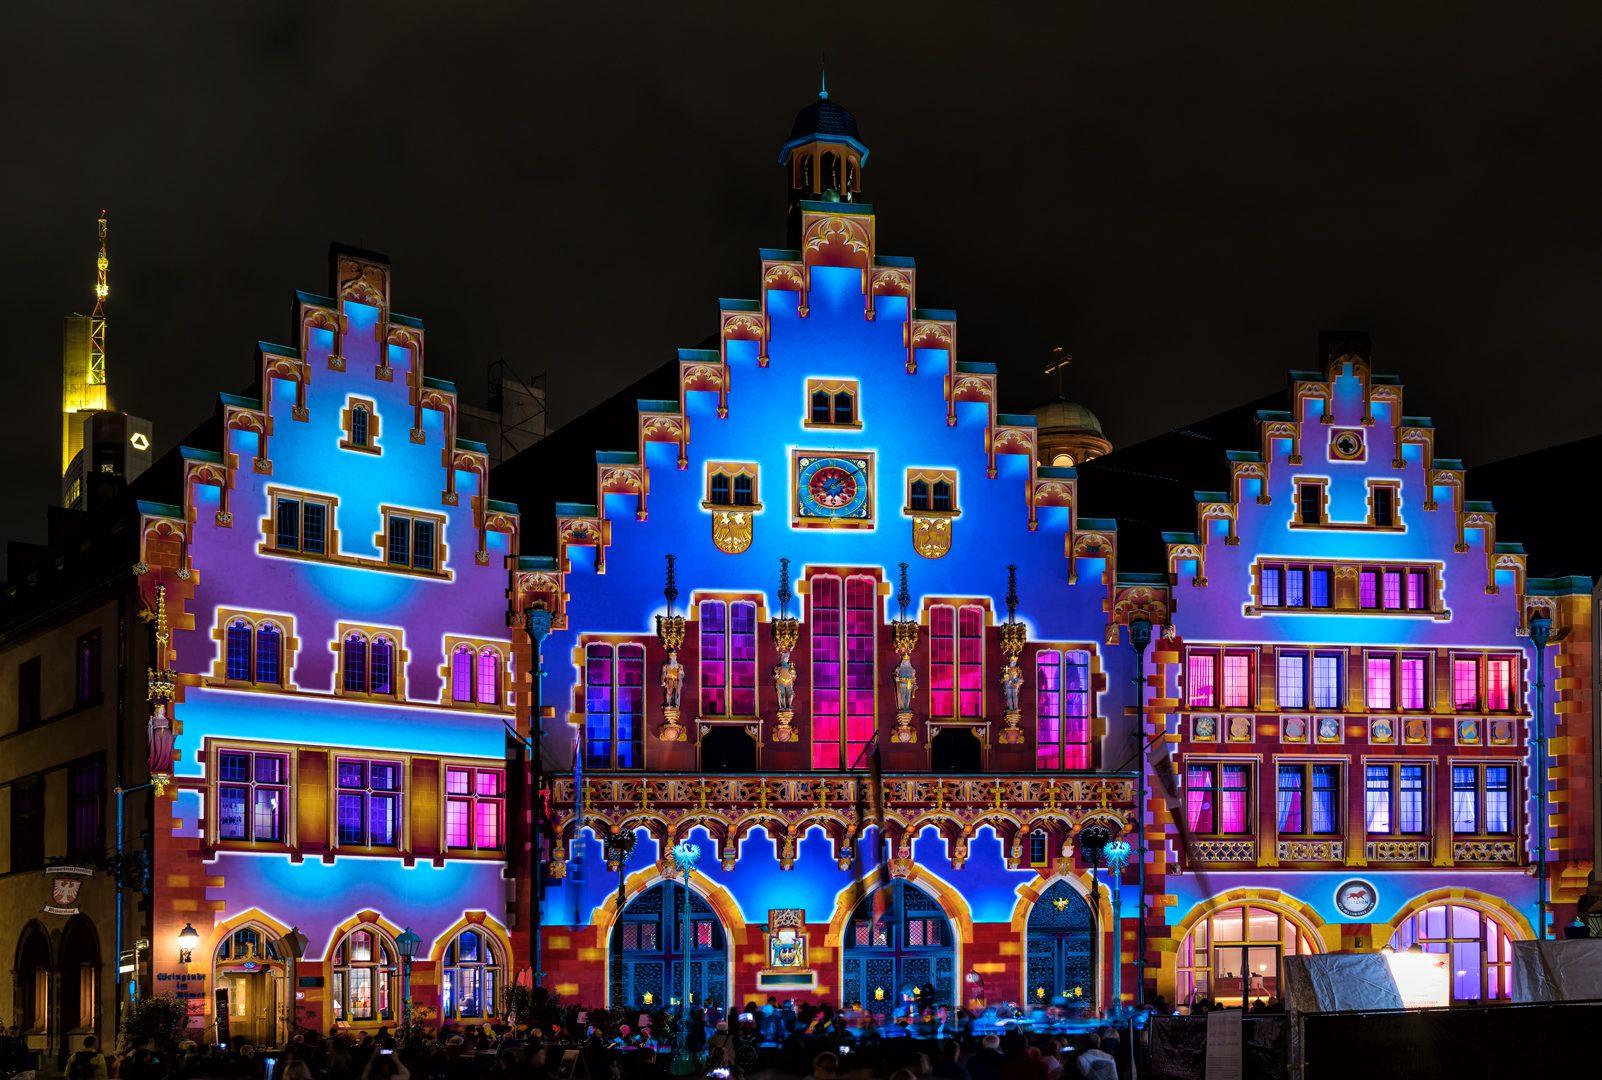 Foto: Rolf Zipf-Marks – Römer (Rathaus) – Frankfurt am Main